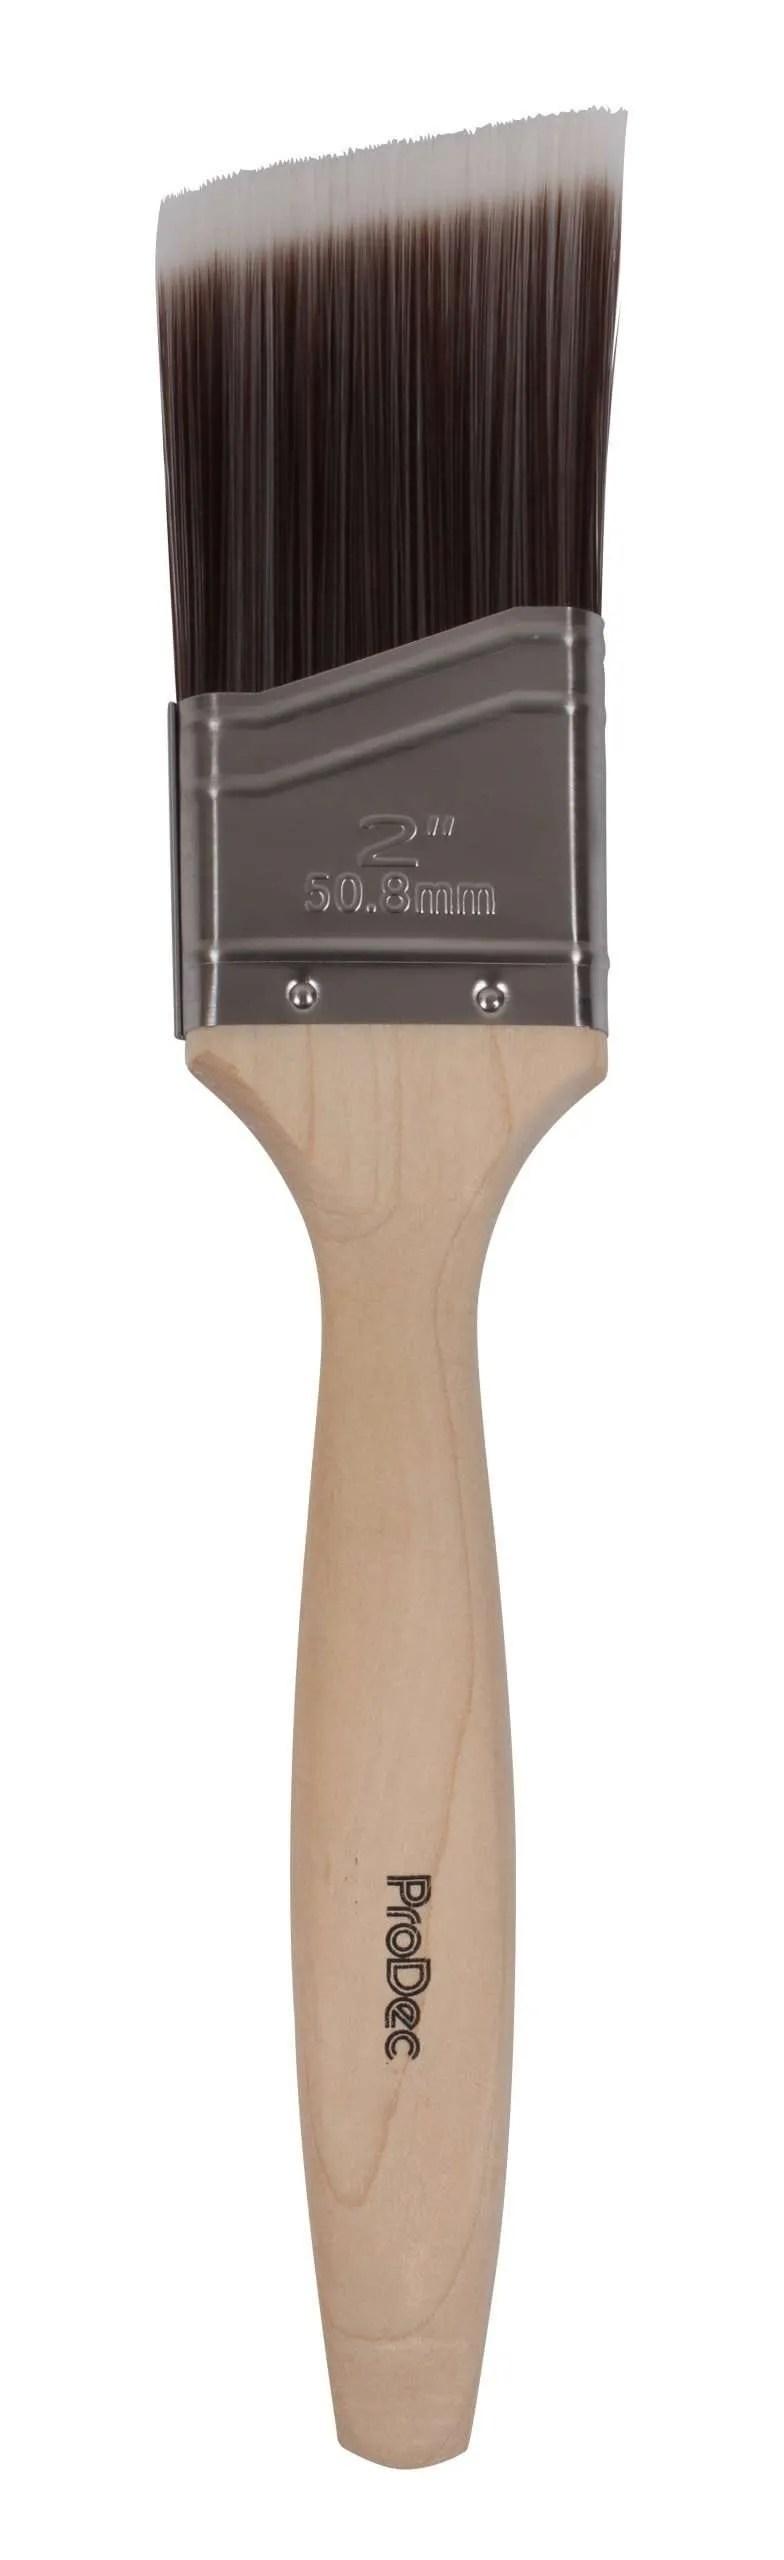 ProDec-Premier-Cutting-In-Paint-Brush-2in-PBPT053